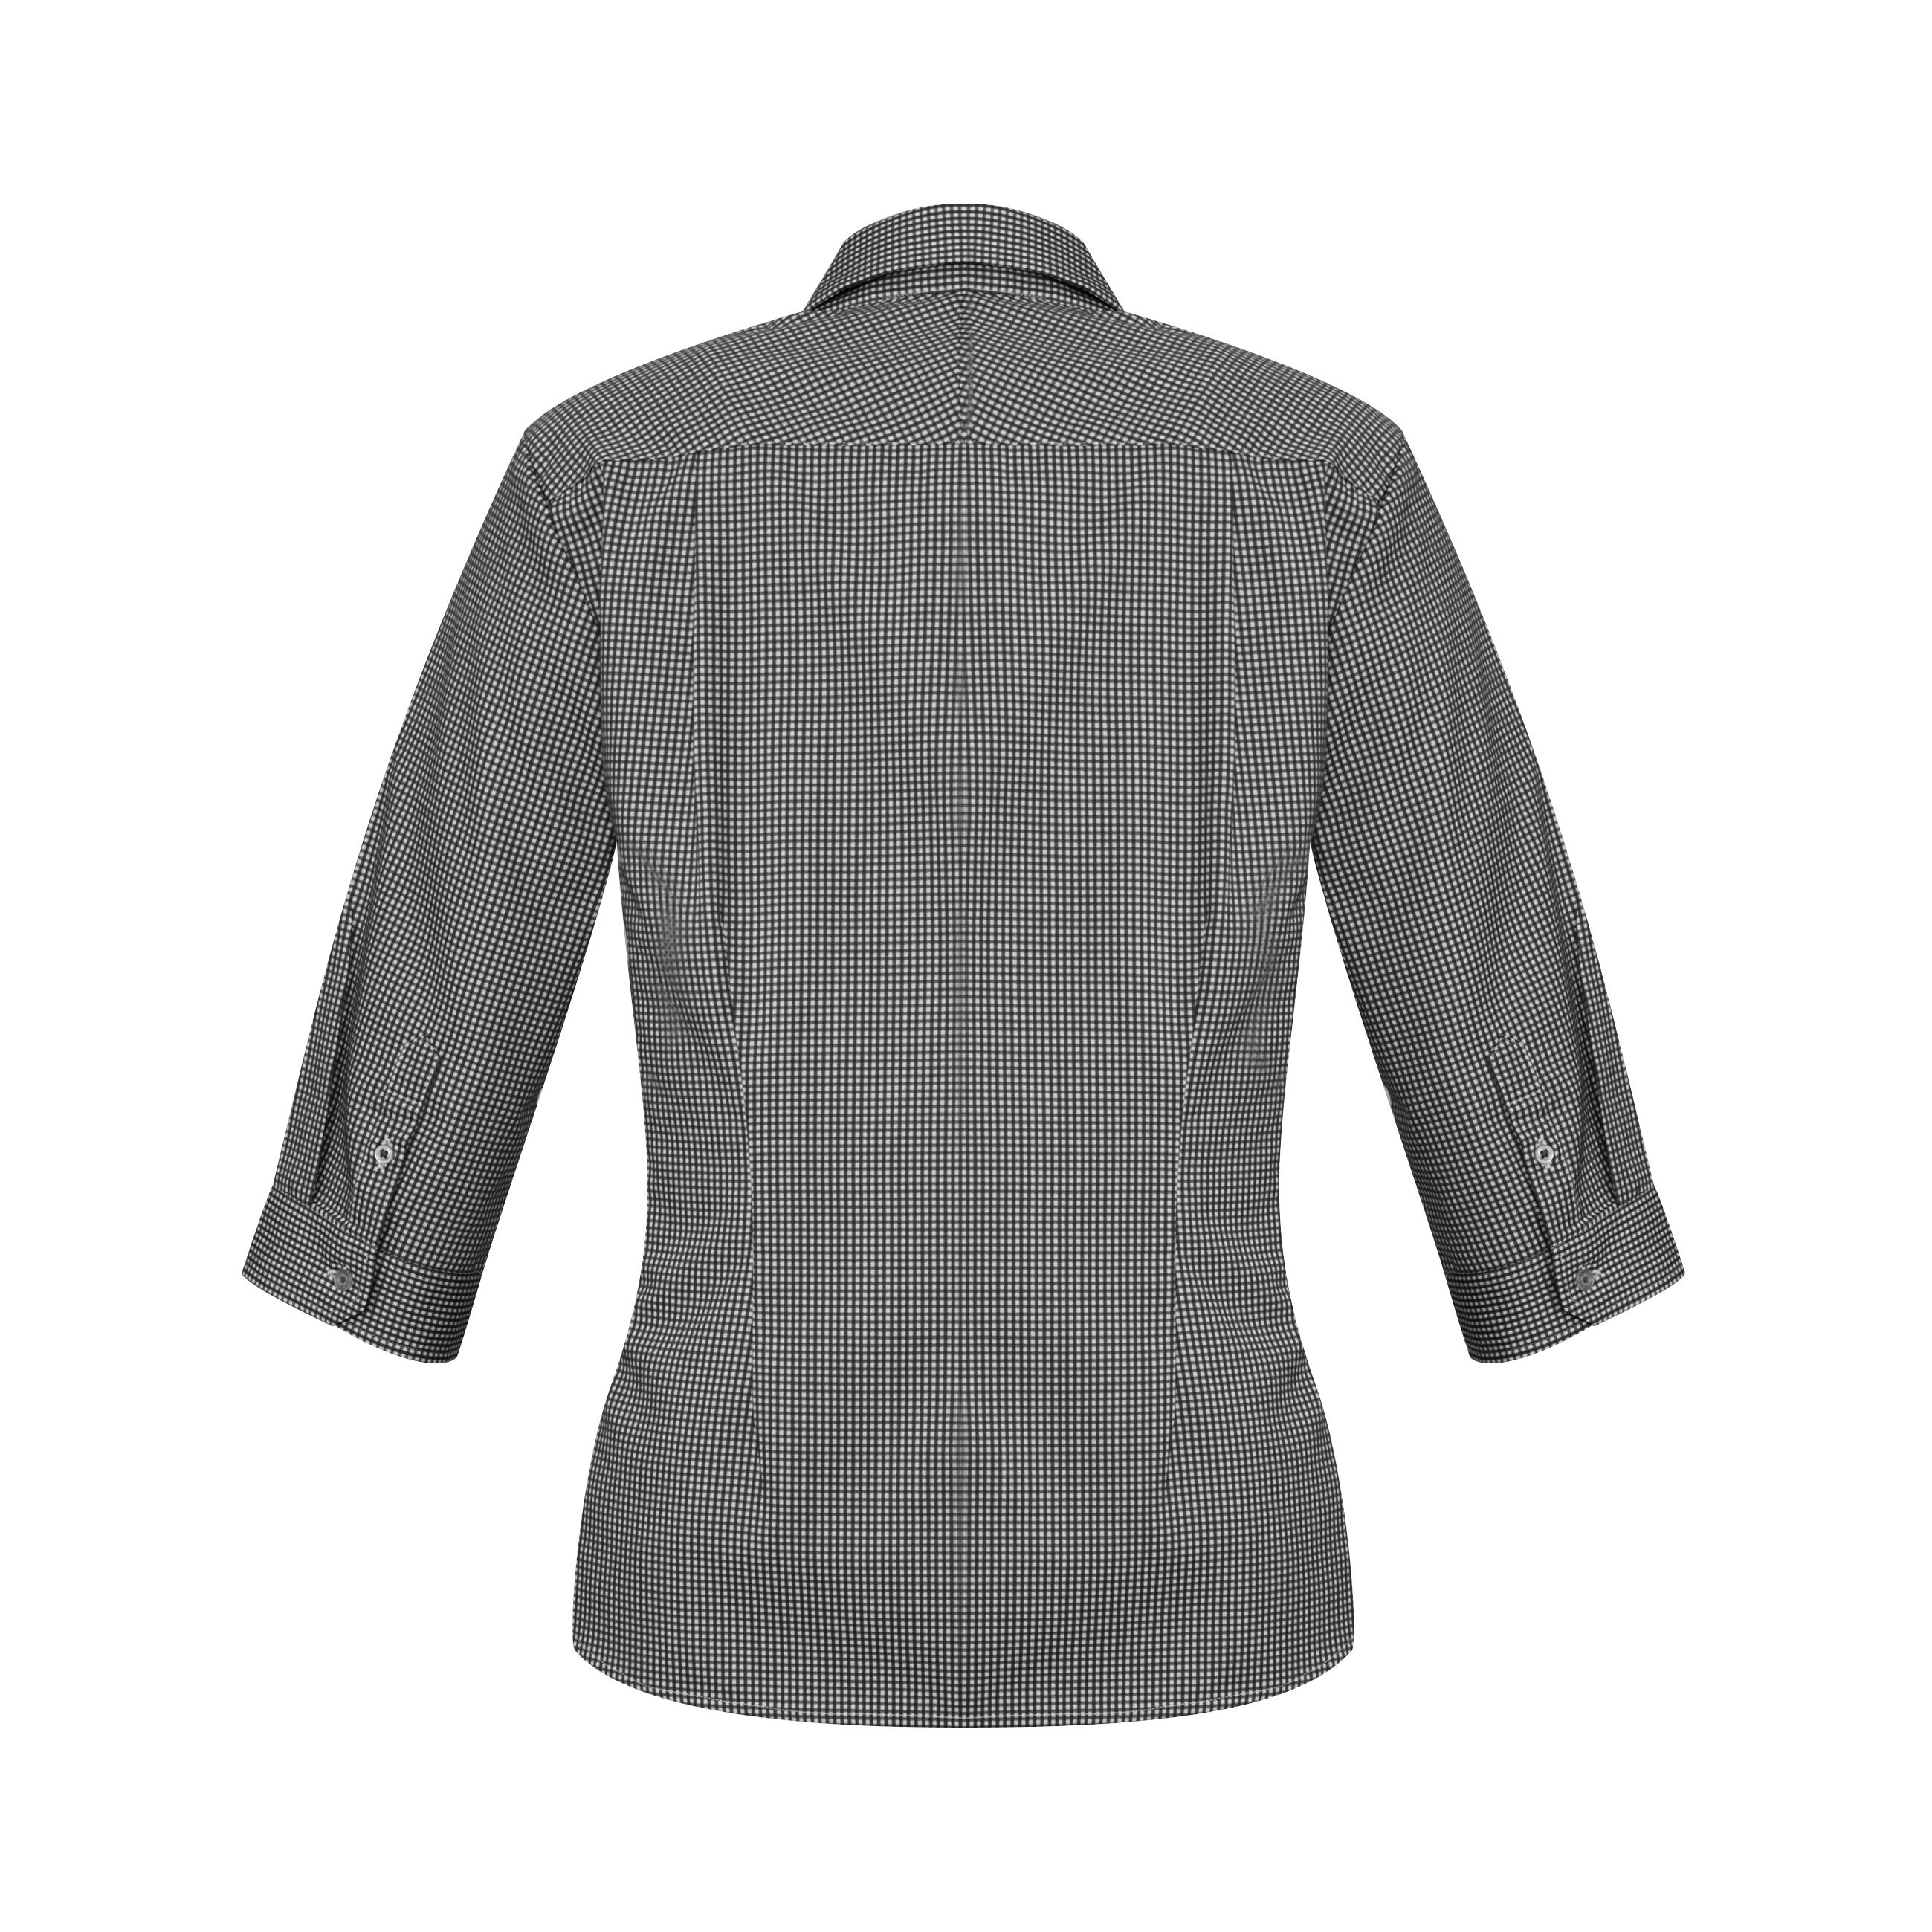 Shirt design online australia - Sale